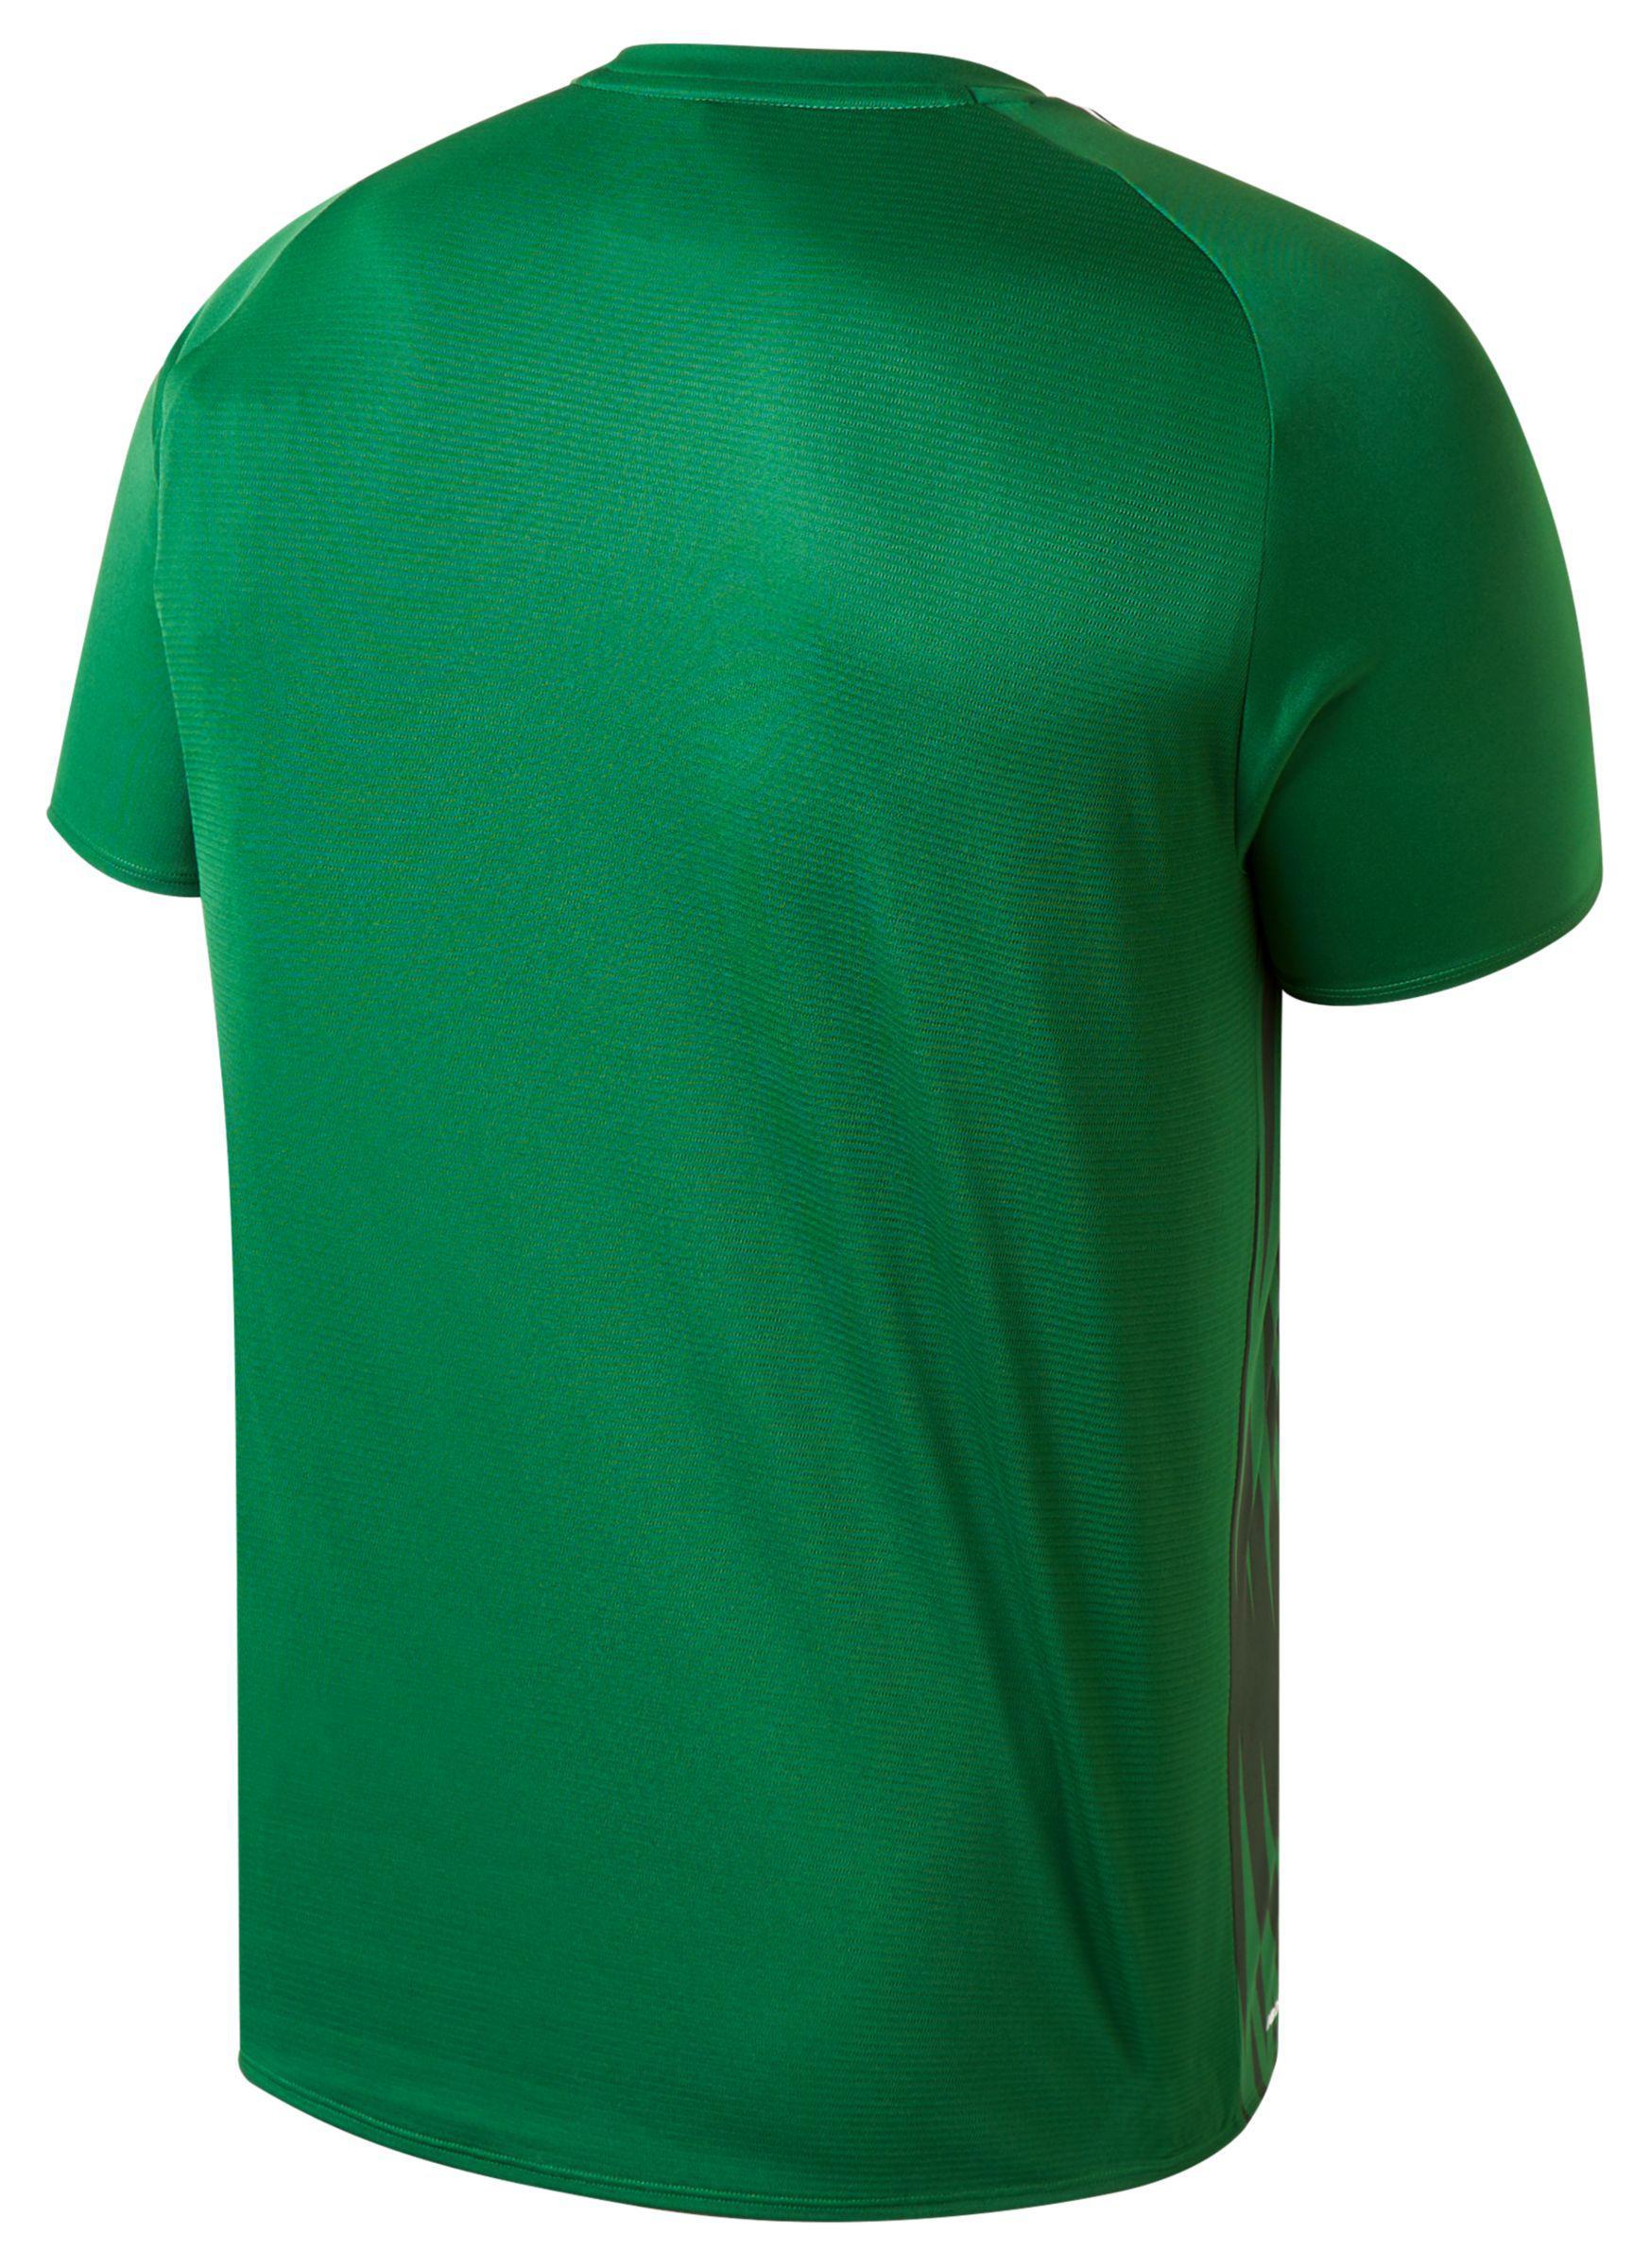 a6b610acf New Balance - Green Celtic Fc Elite Training Match Day Jersey for Men -  Lyst. View fullscreen